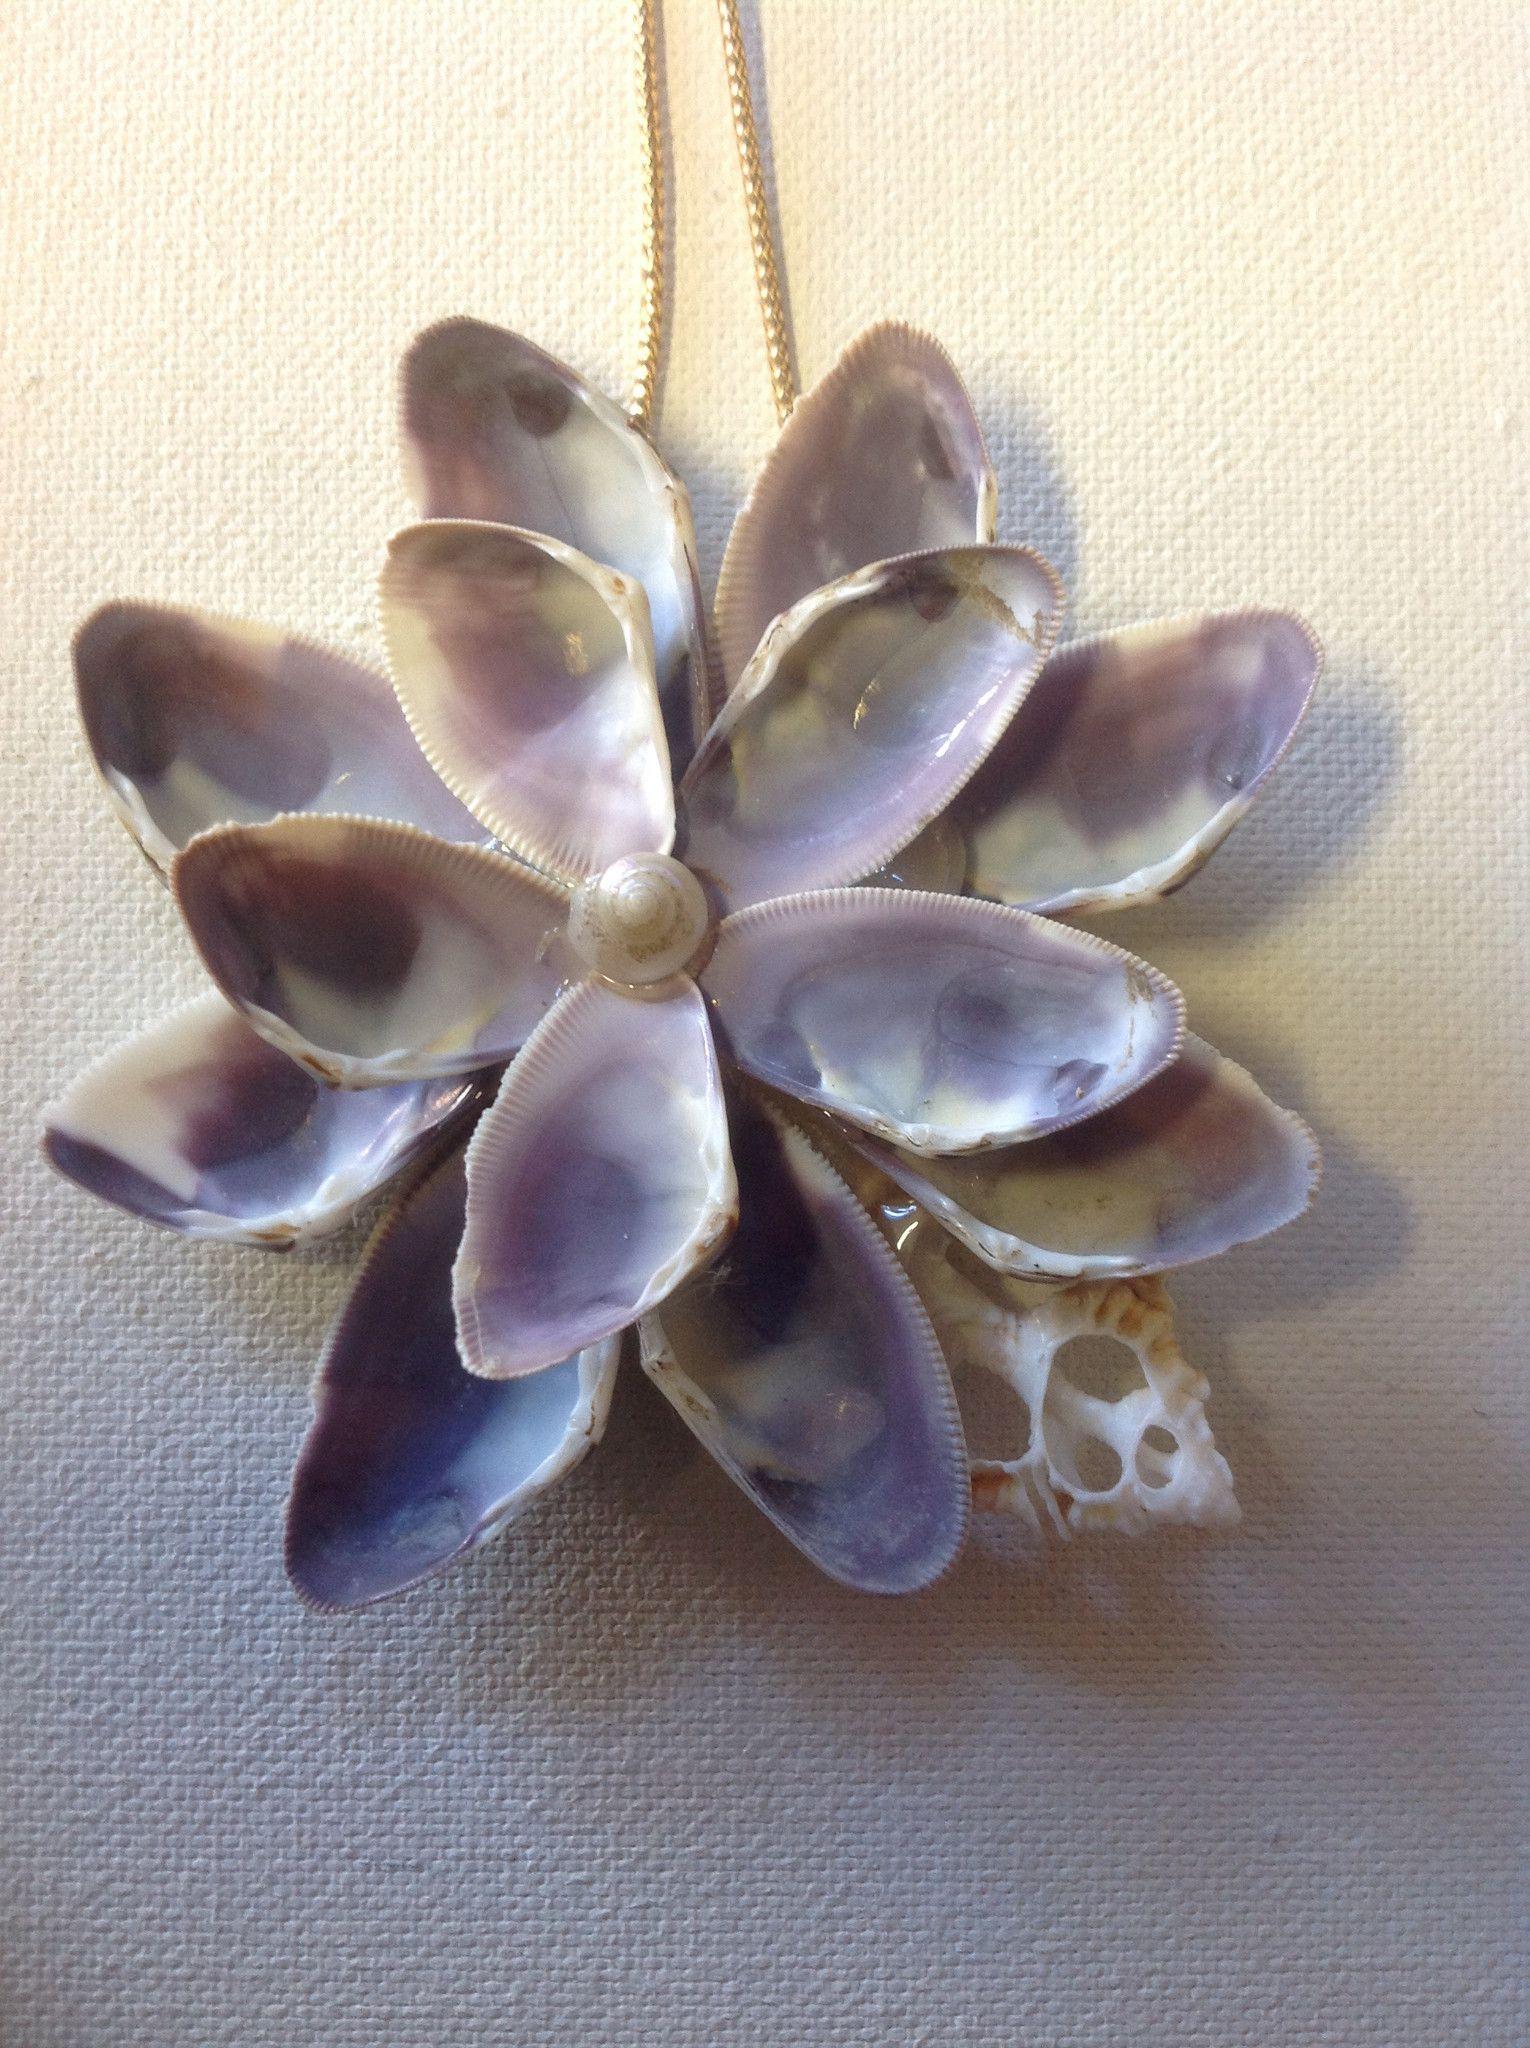 Seashell flower ornament flower ornaments shell and for Seashell ornaments diy